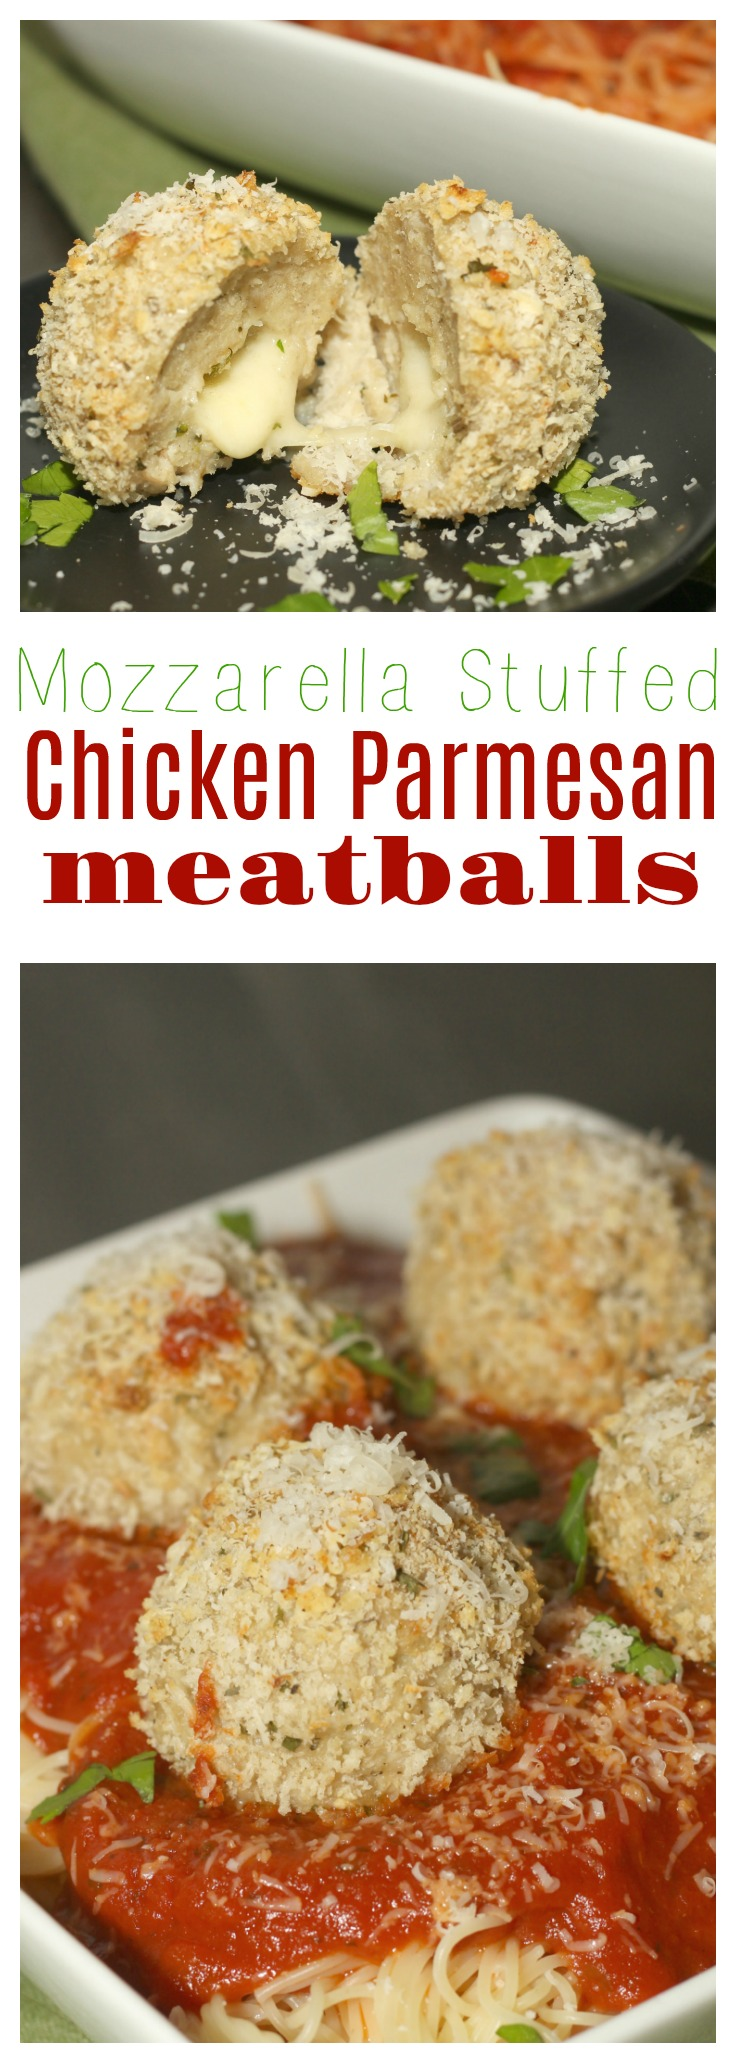 Mozzarella Stuffed Chicken Parmesan Meatballs